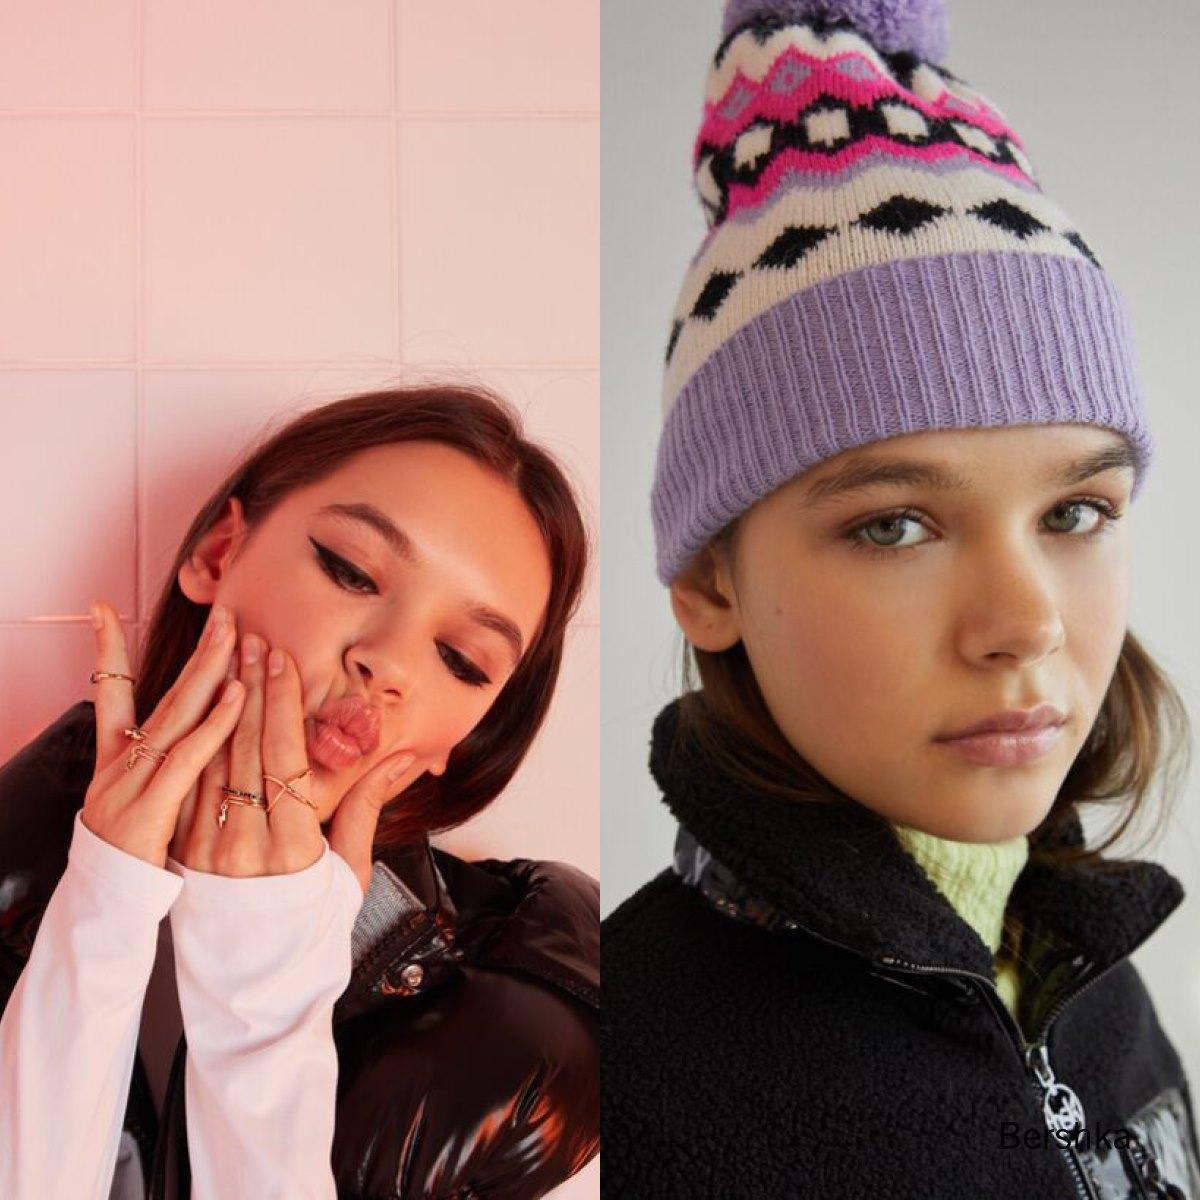 Casting modelando ropa de Bershka Enero 2021